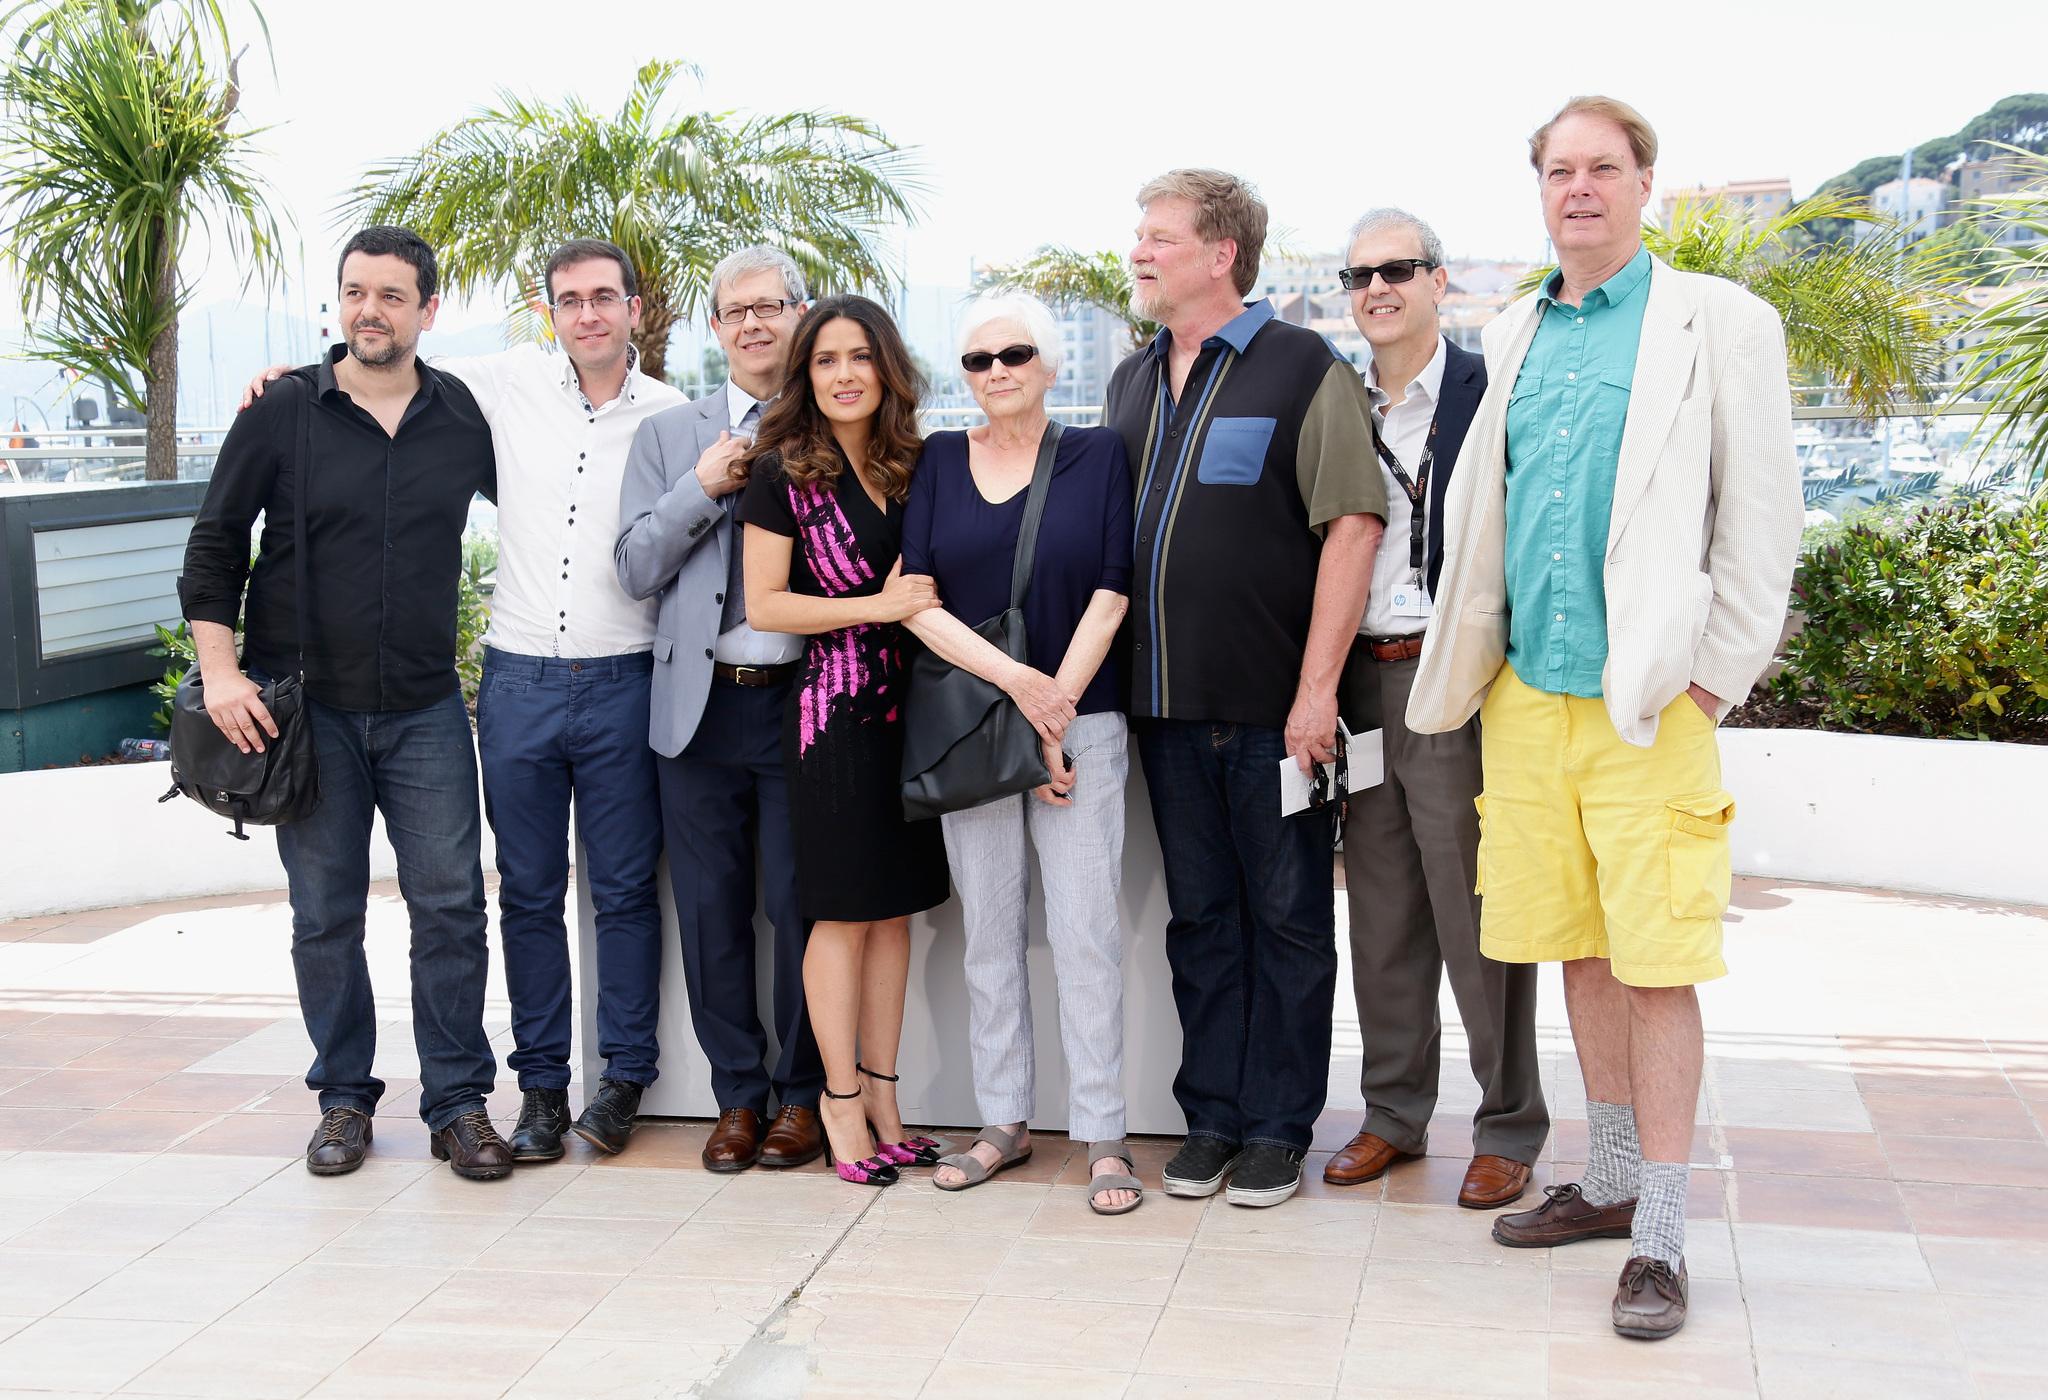 Salma Hayek, Roger Allers, Gaëtan Brizzi, Paul Brizzi, Bill Plympton and Tomm Moore